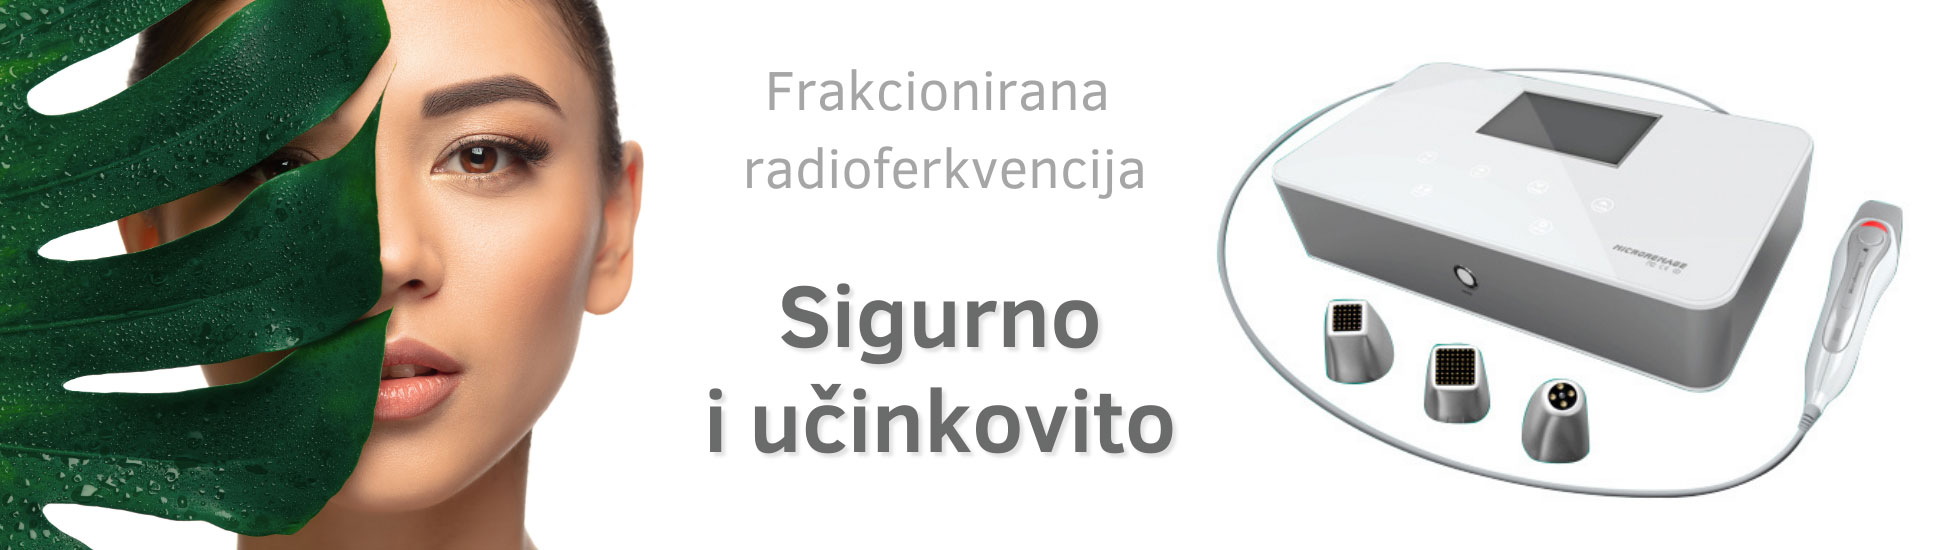 J_frakciorf-1950x550